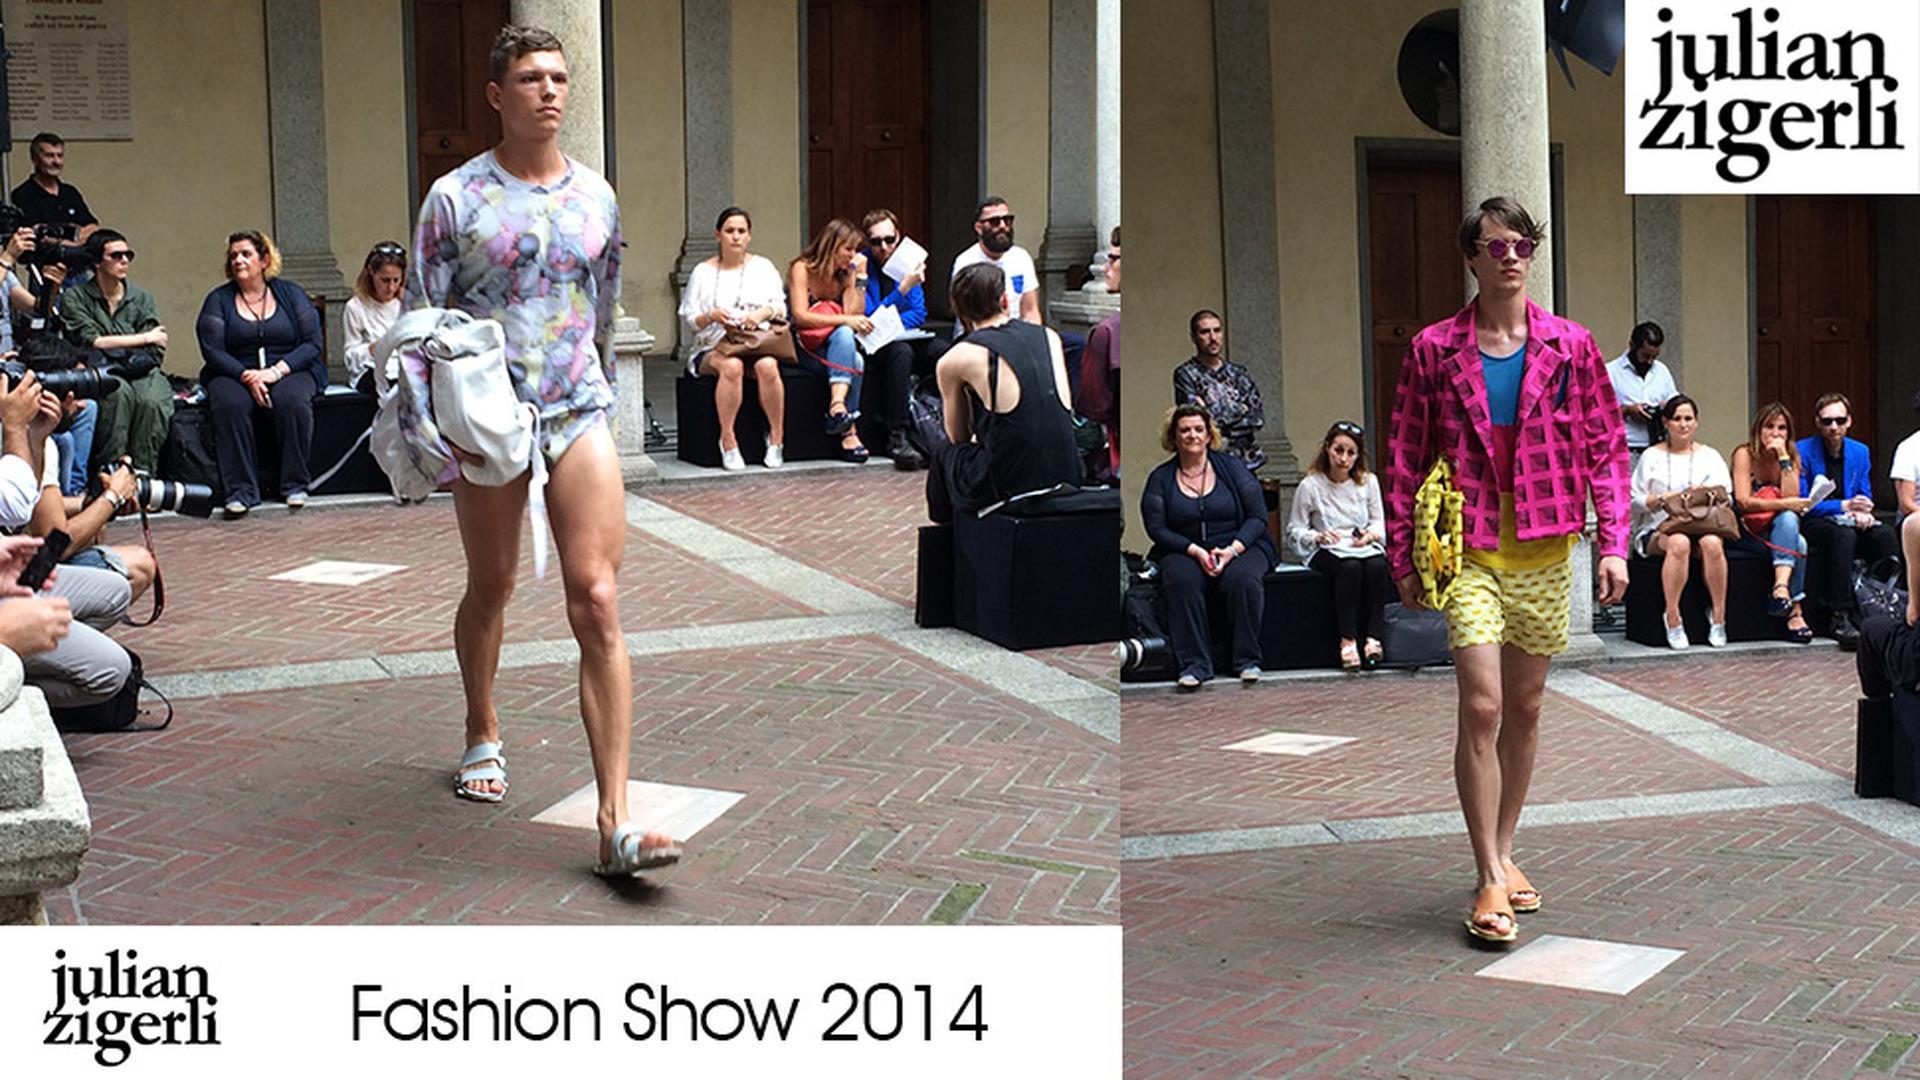 julian-zigerli-fashion-show-spring-summer-2015-men-collection-1920x1080.jpg 39757acc15d